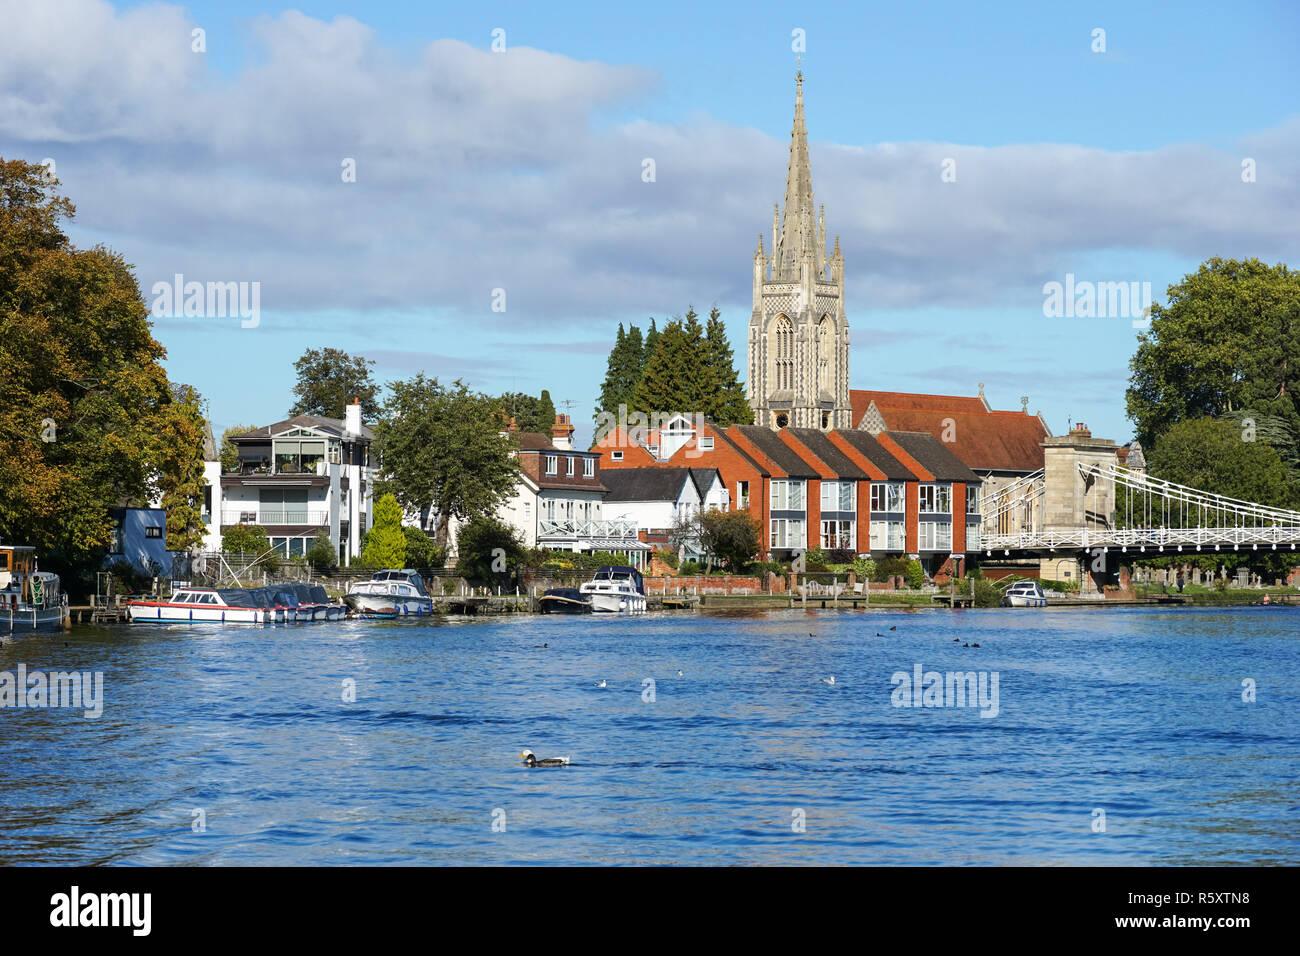 The River Thames in Marlow, Buckinghamshire, England United Kingdom UK - Stock Image